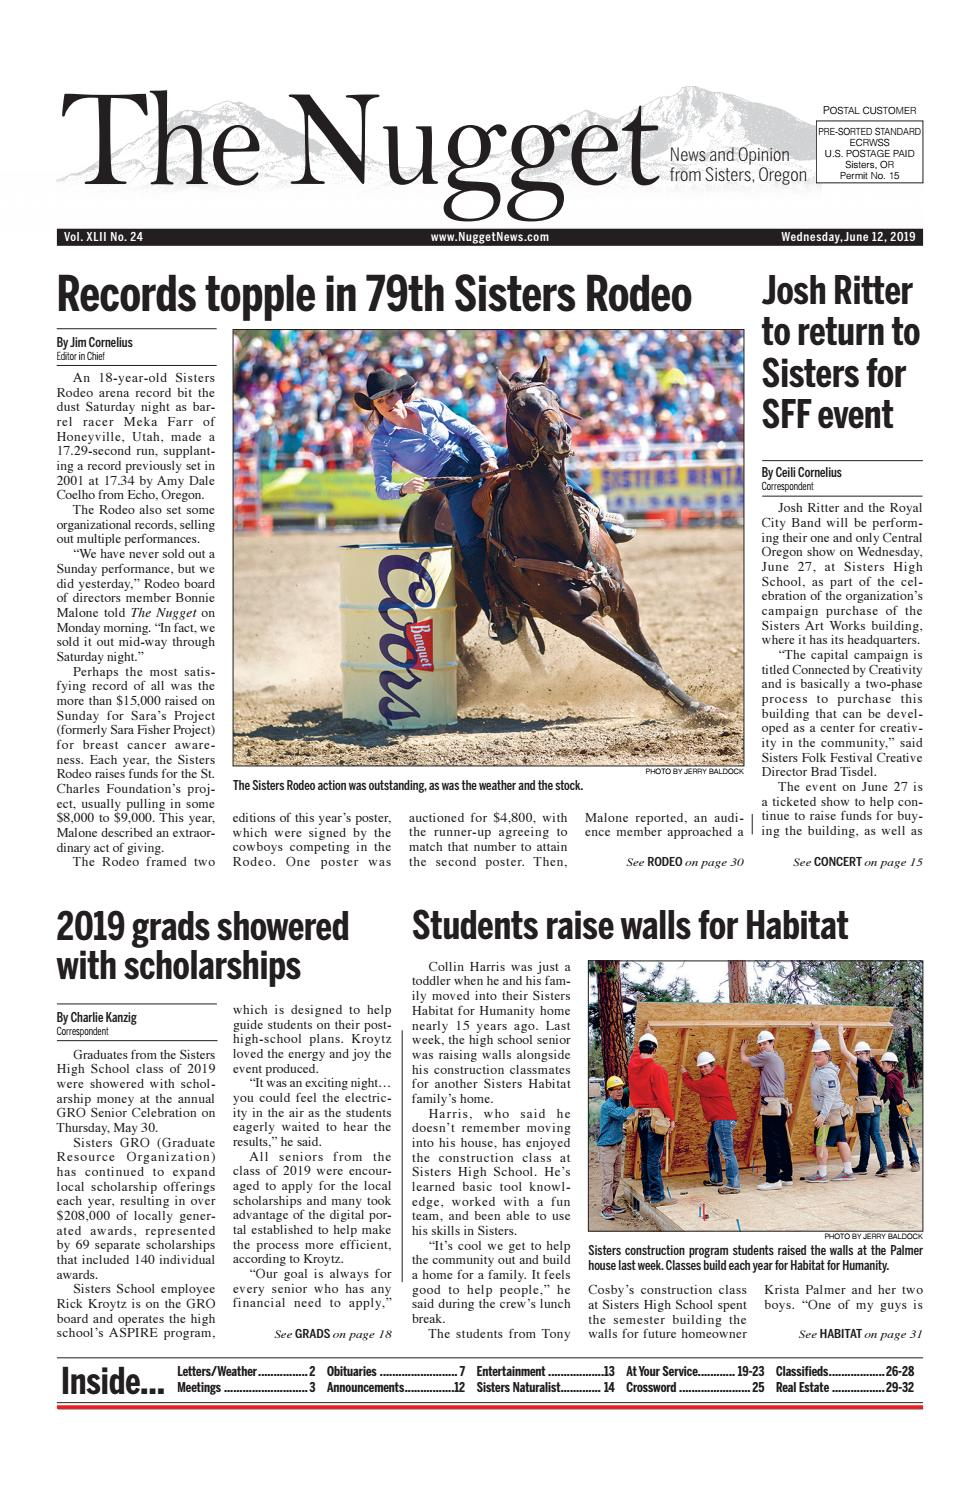 The Nugget Newspaper // Vol  XLII No  24 // 2019-06-12 by